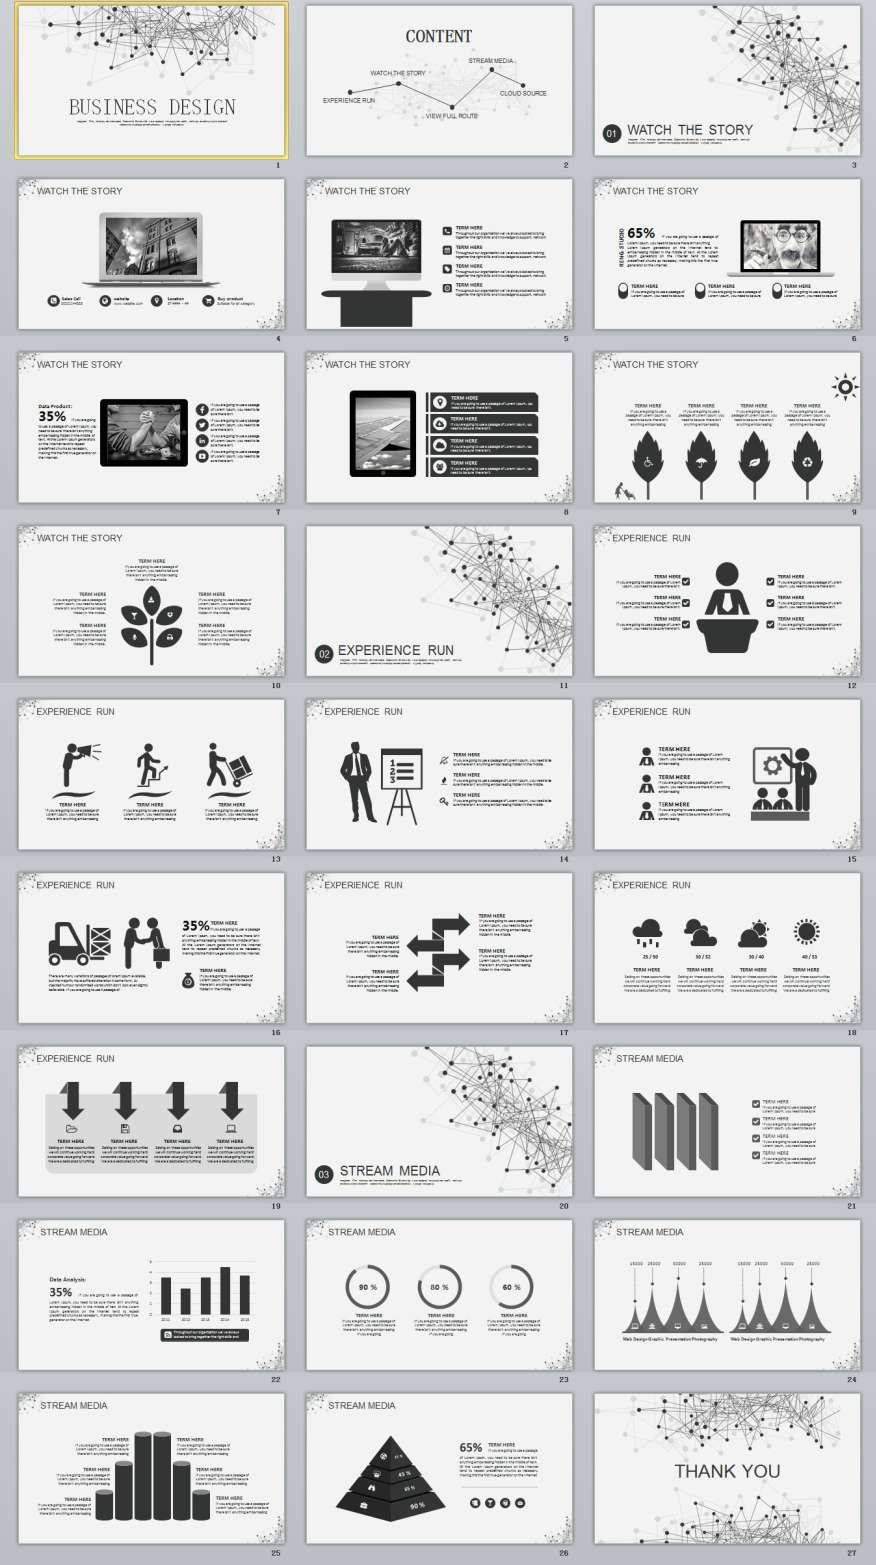 27 gray business report powerpoint templates new powerpoint 27 gray business report powerpoint templates toneelgroepblik Choice Image